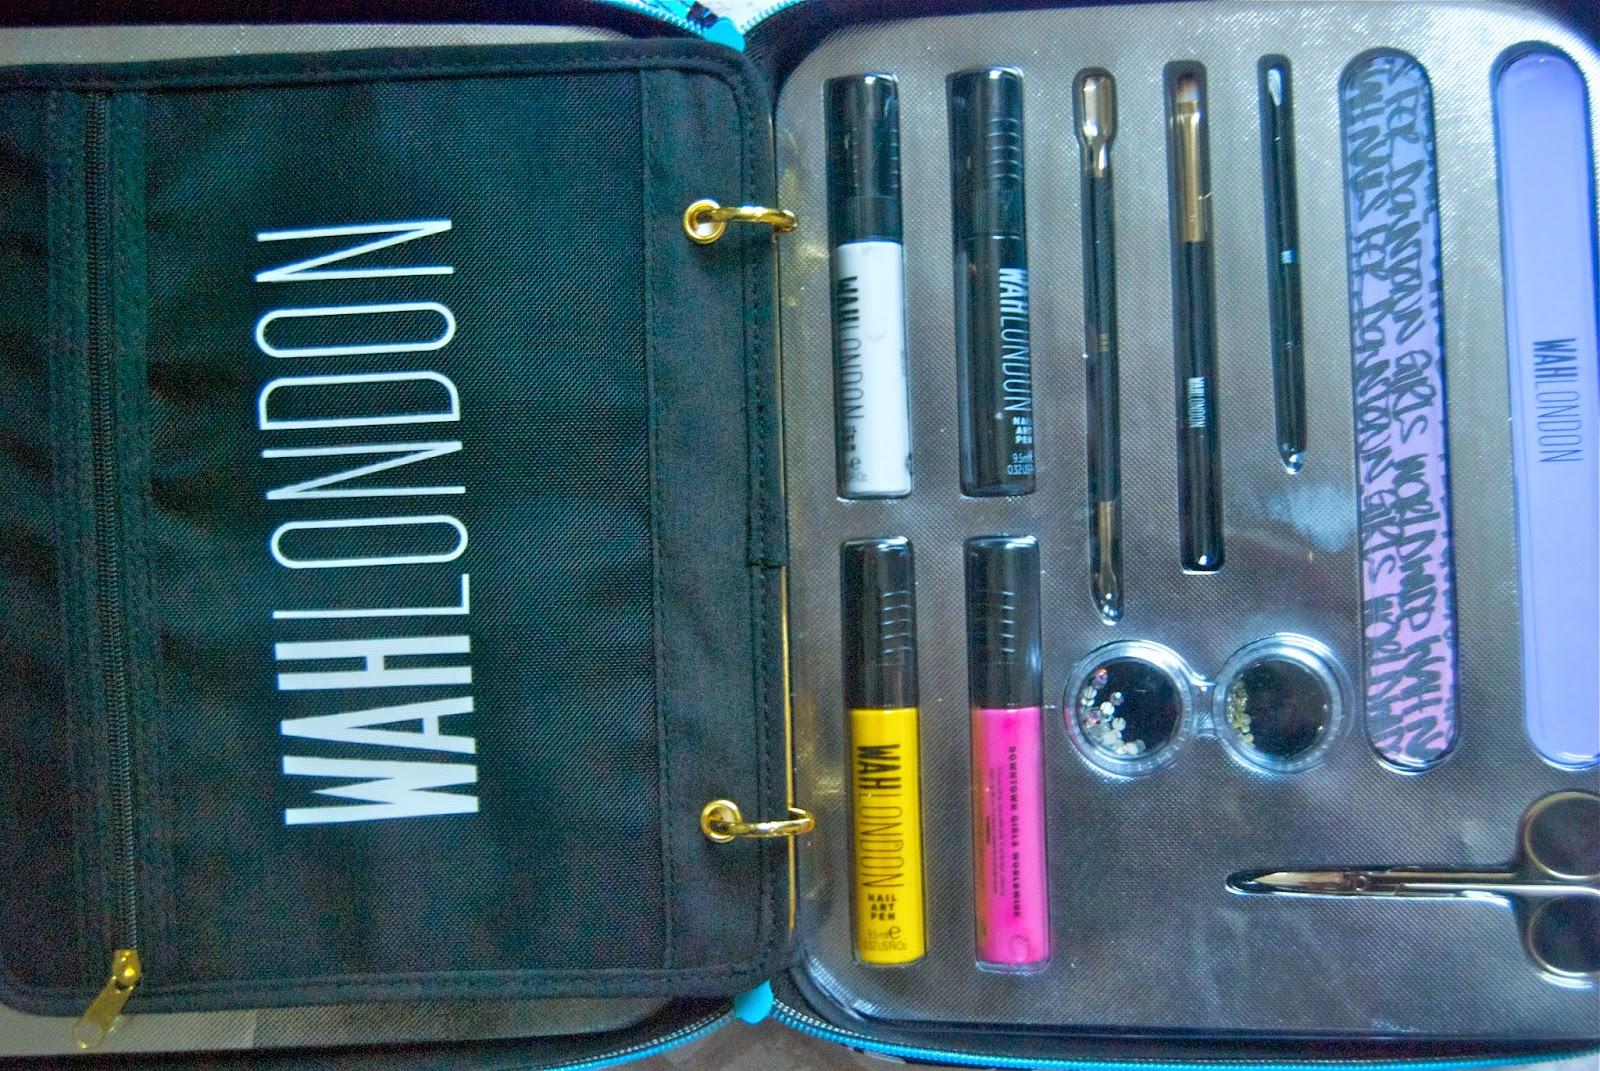 Review Wah London The Ultimate Nail Art Kit